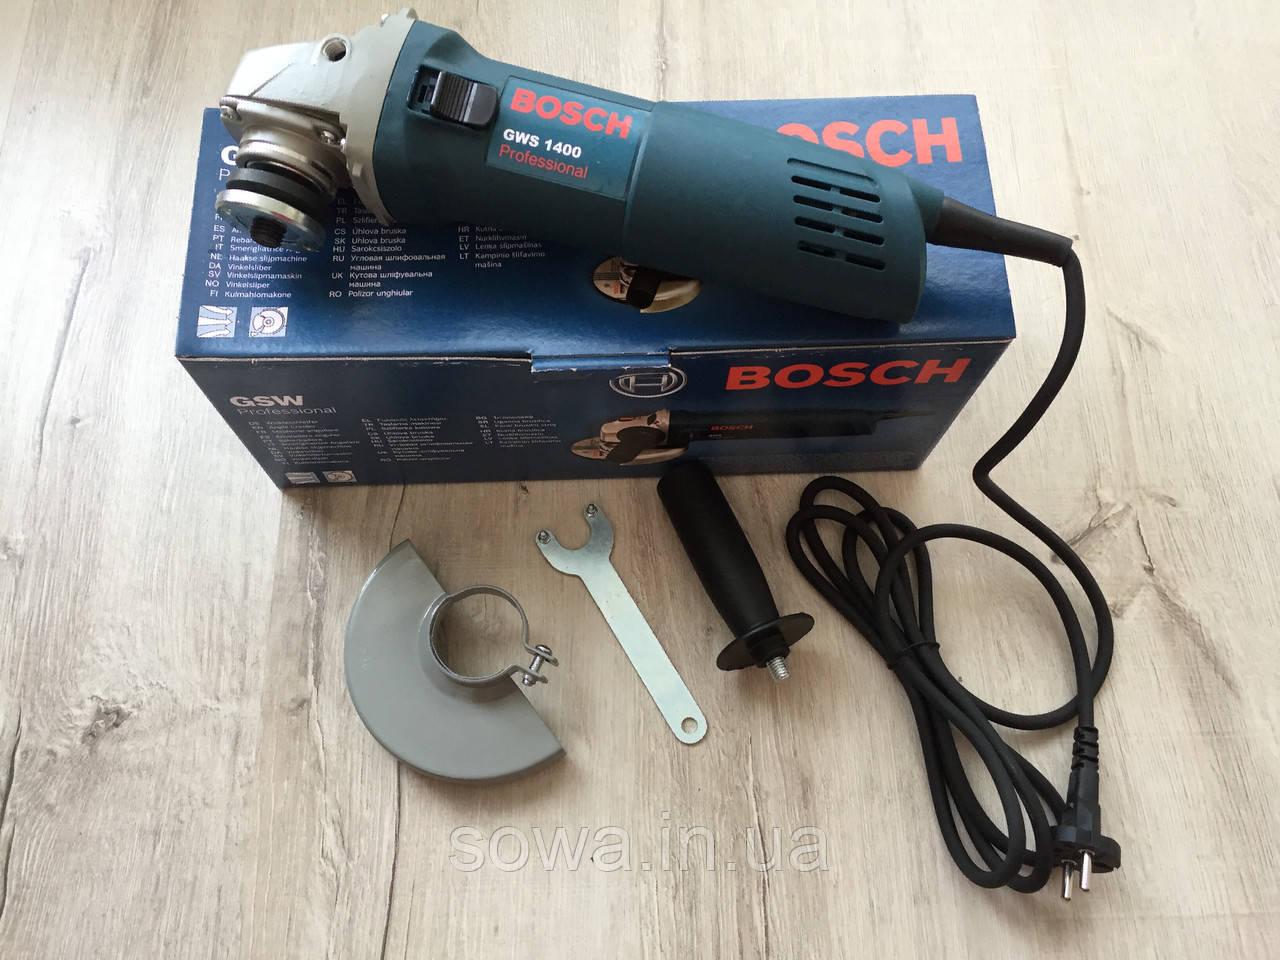 ✔️ Болгарка Bosch/Бош GWS1400 | 125мм, 1400Вт